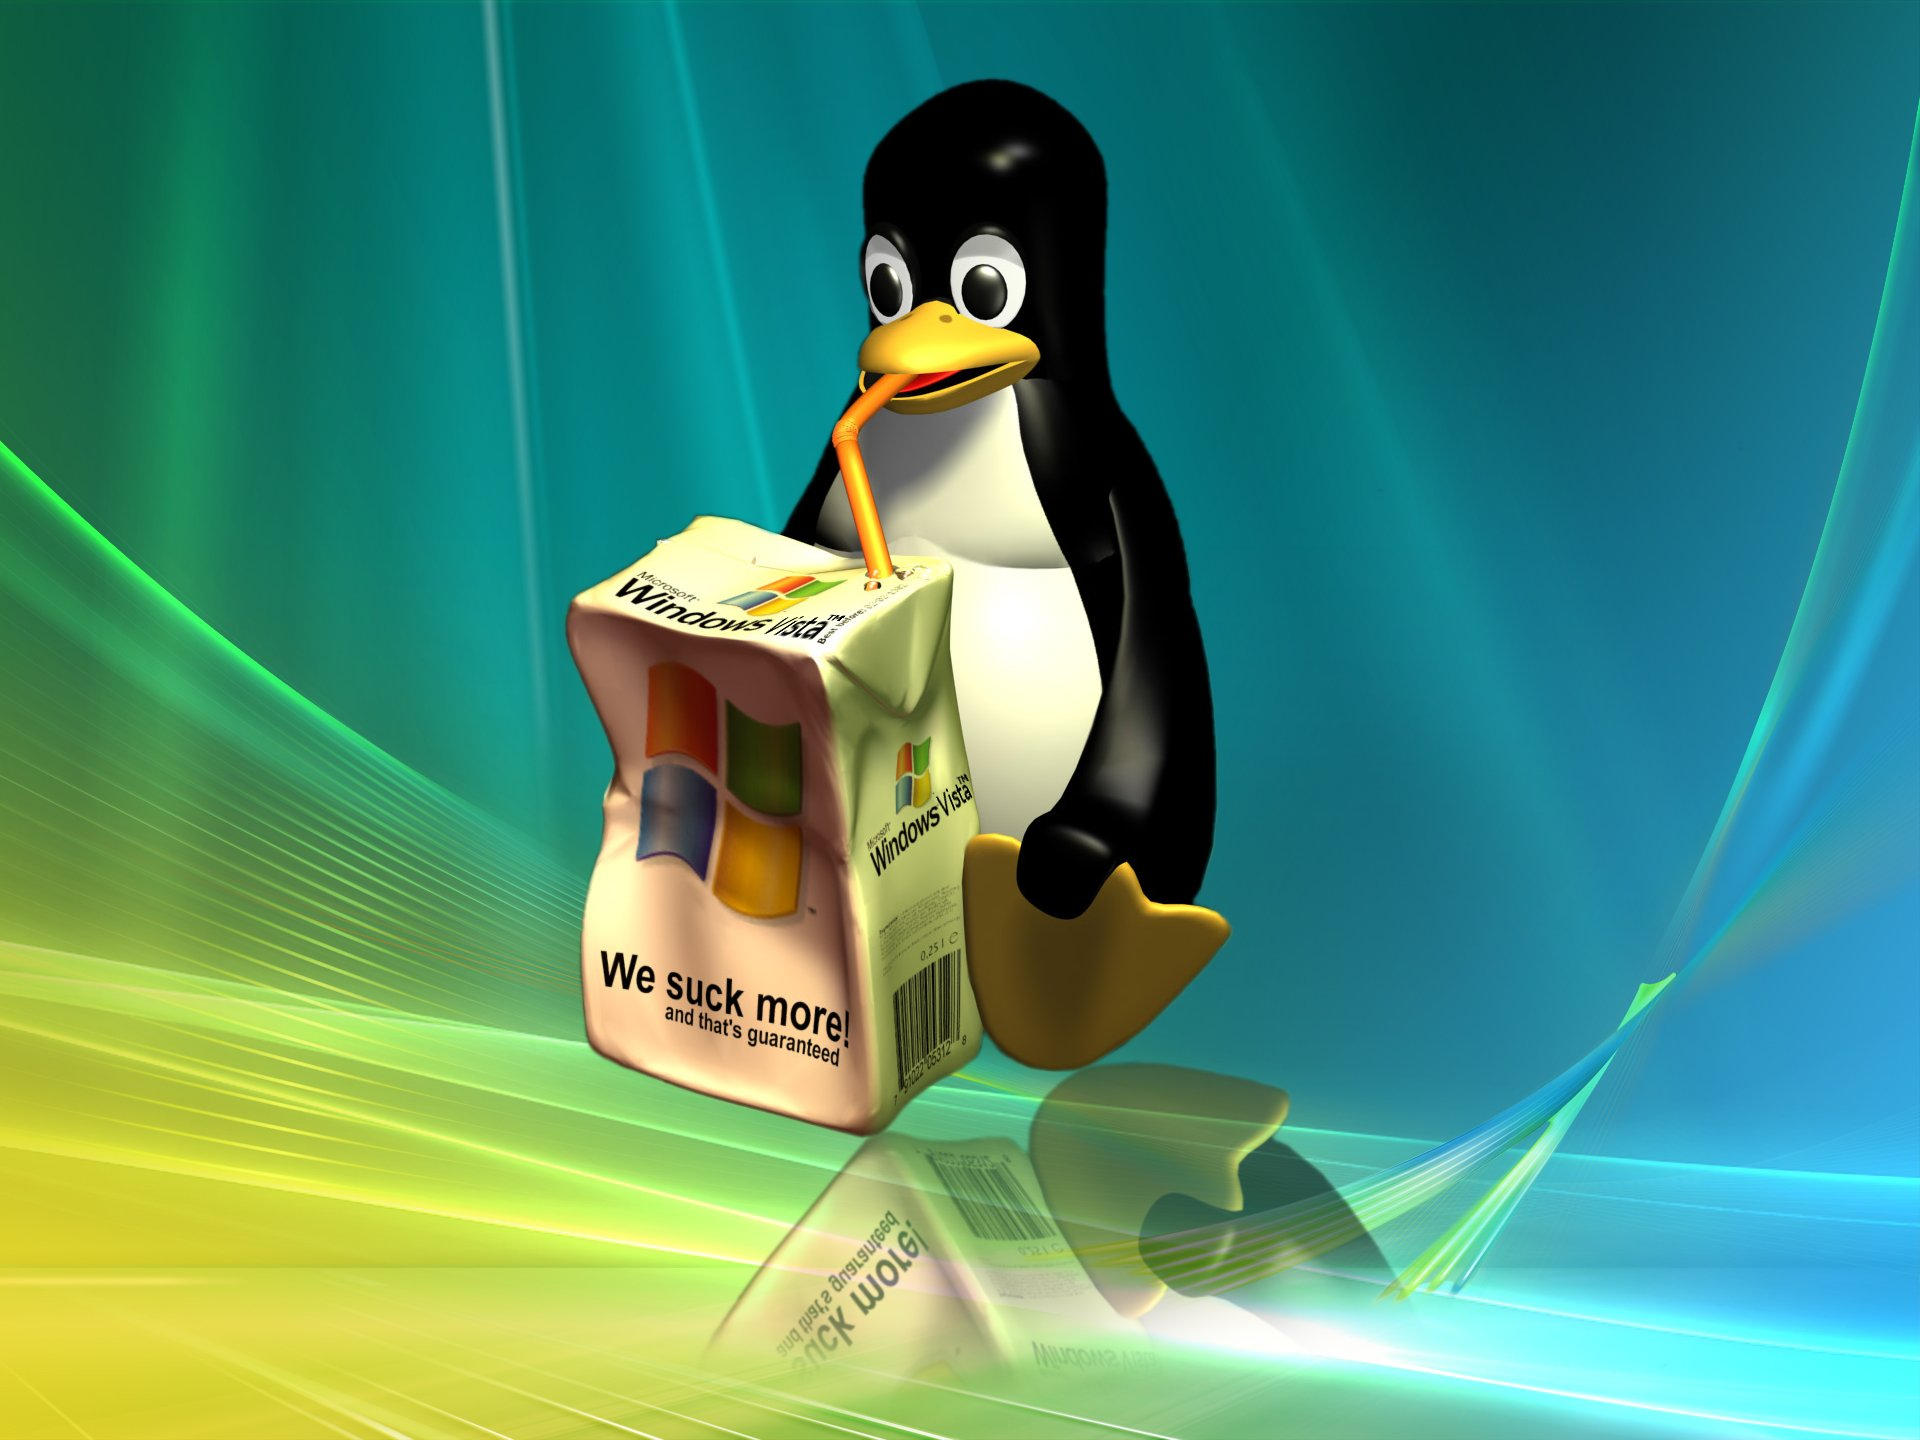 Linux Wallpaper 1920x1440